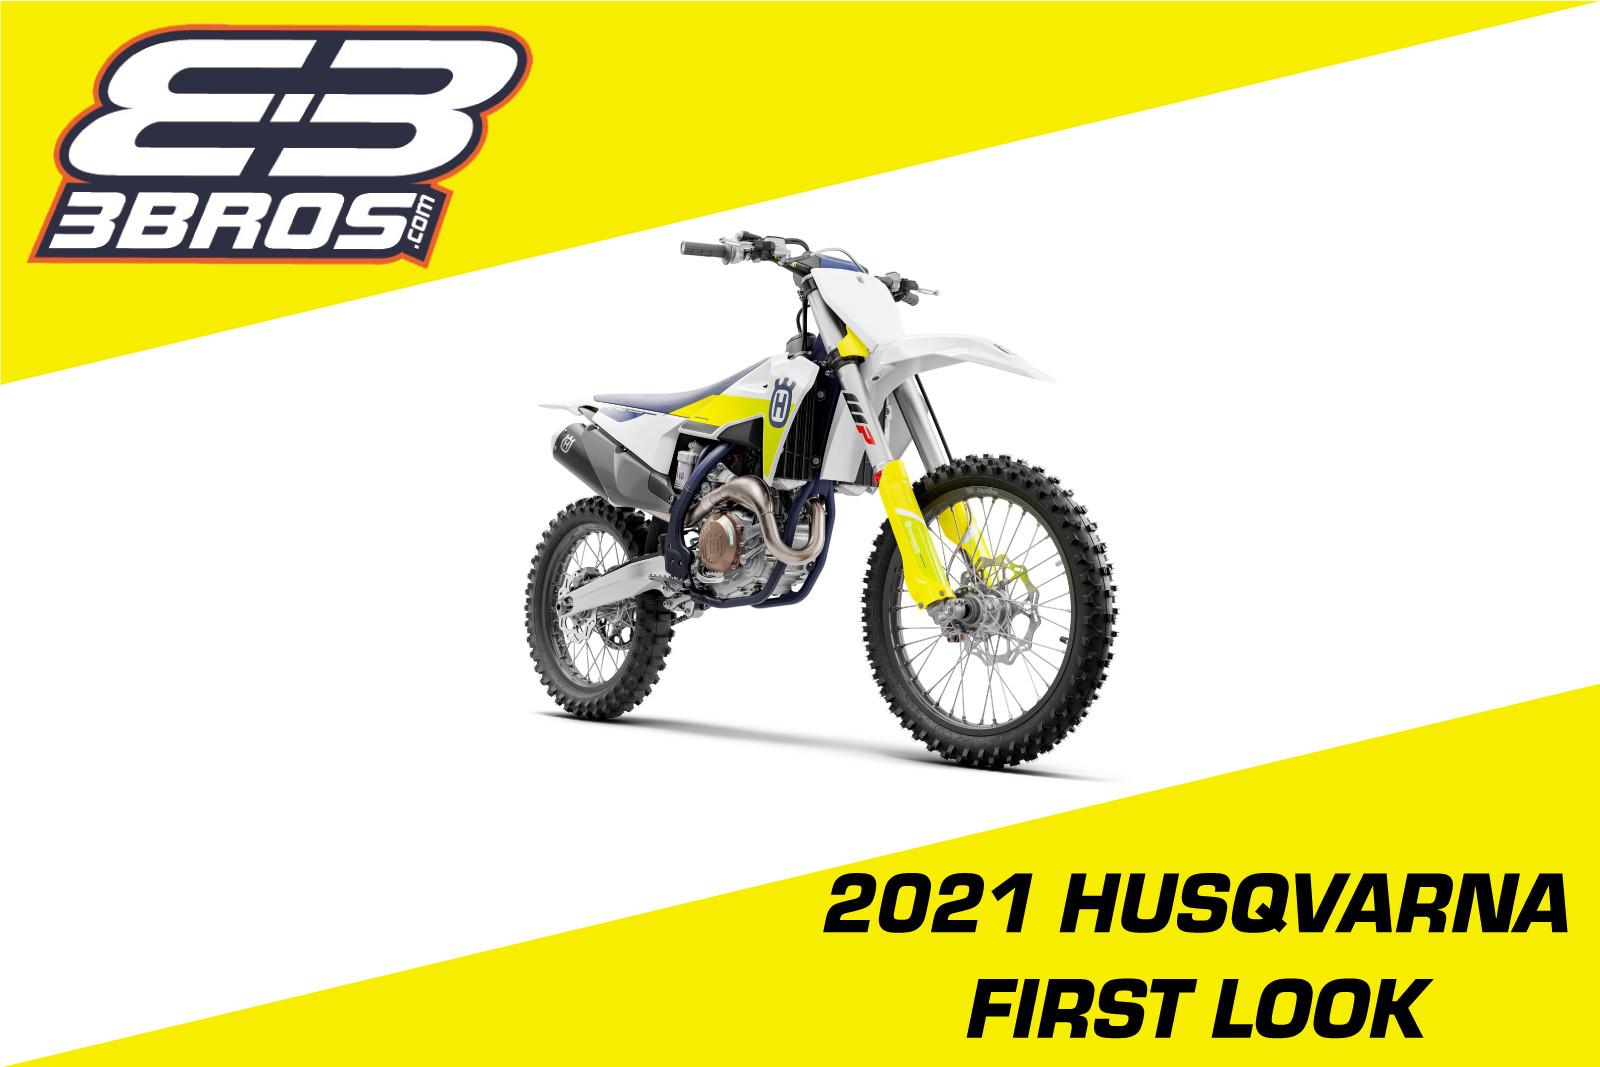 3BROS Racing: 2021 Husqvarna's Now In-Stock